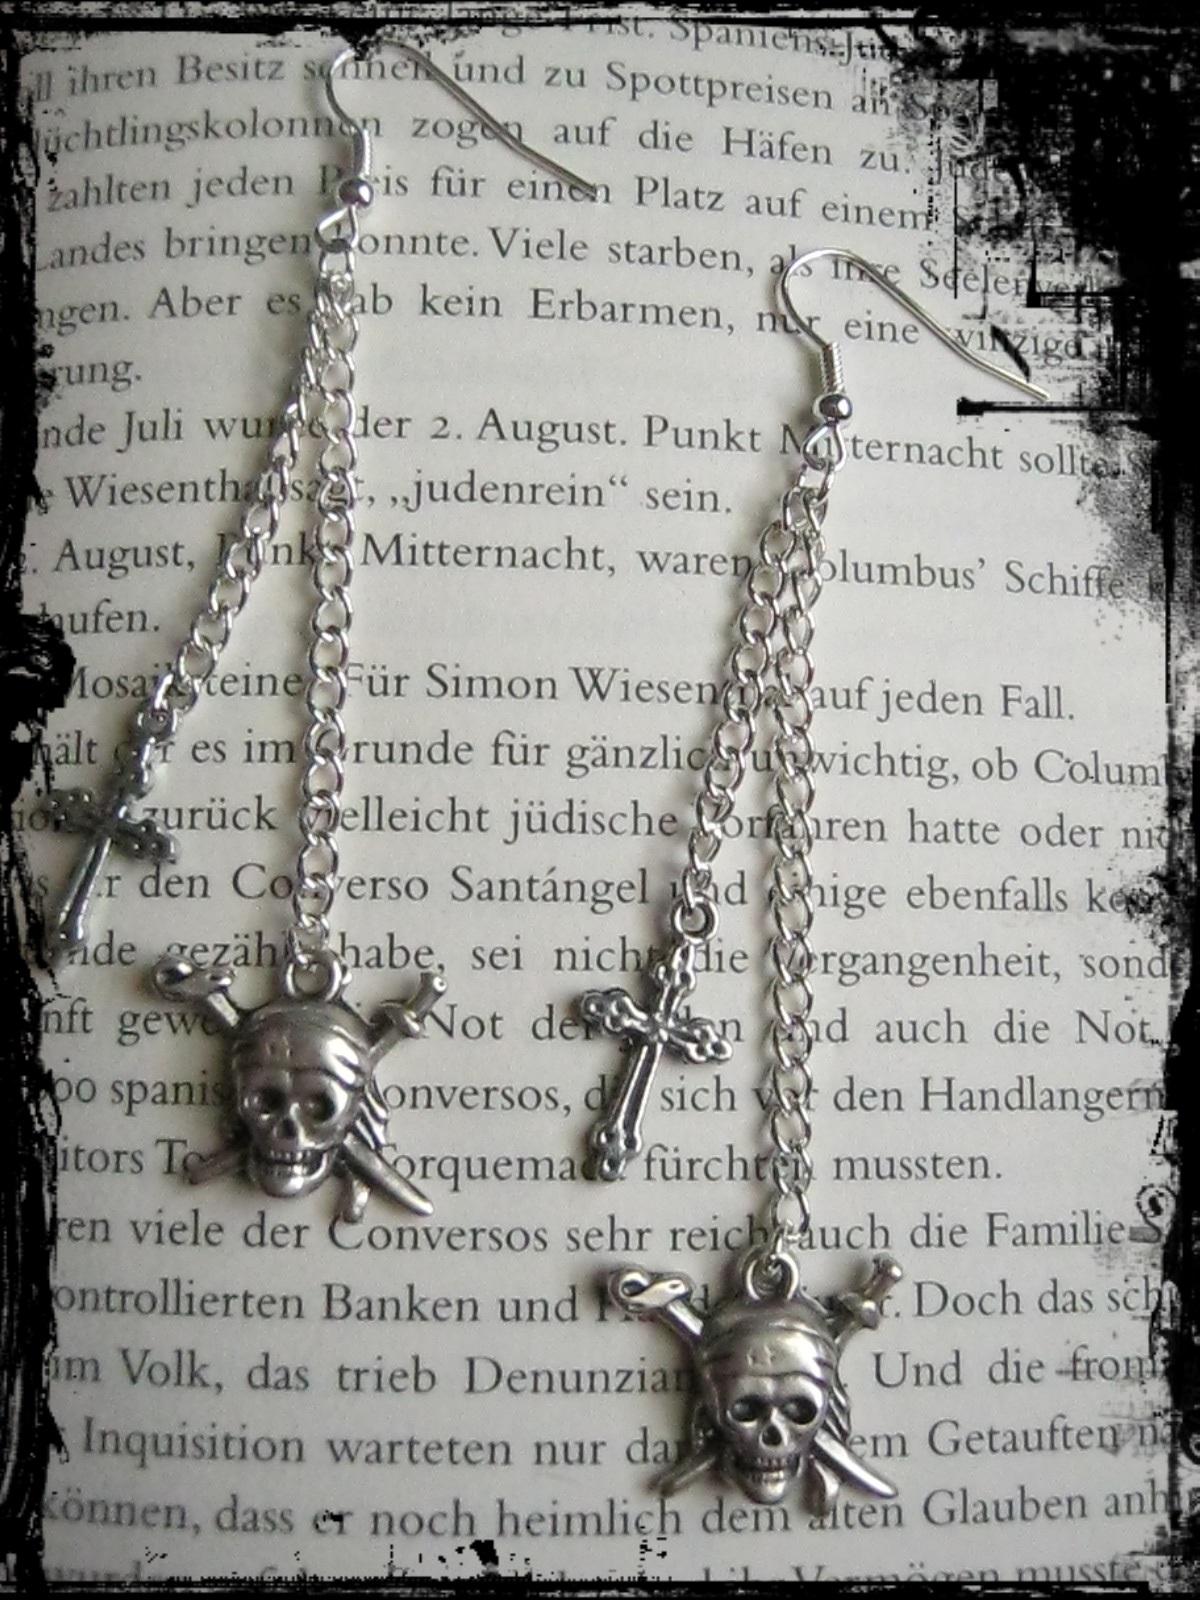 pirates_cross_earrings_goth_earrings_2.JPG